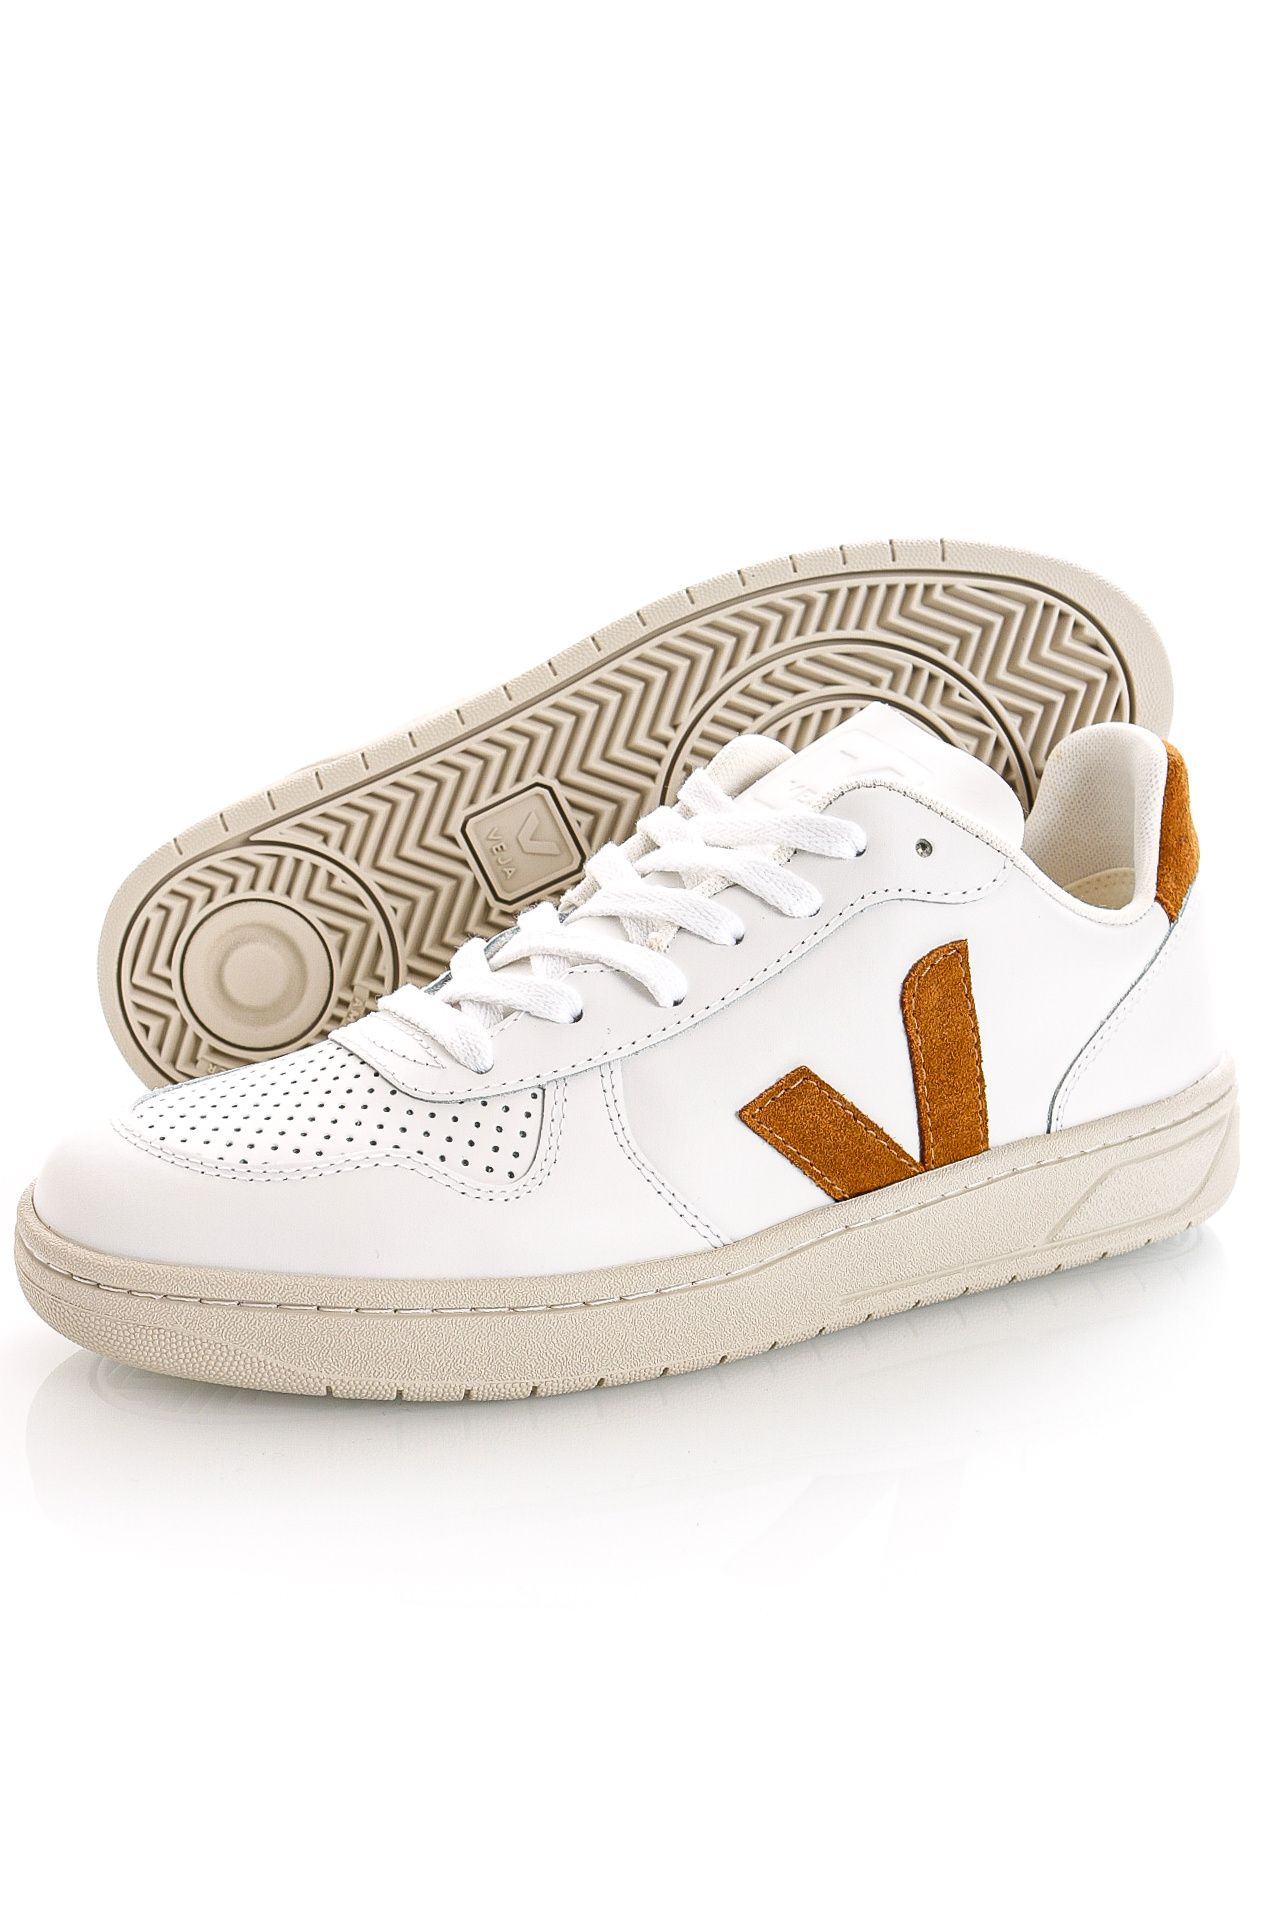 Afbeelding van Veja Sneakers V-10 LEATHER EXTRA-WHITECAMEL VX0202652B